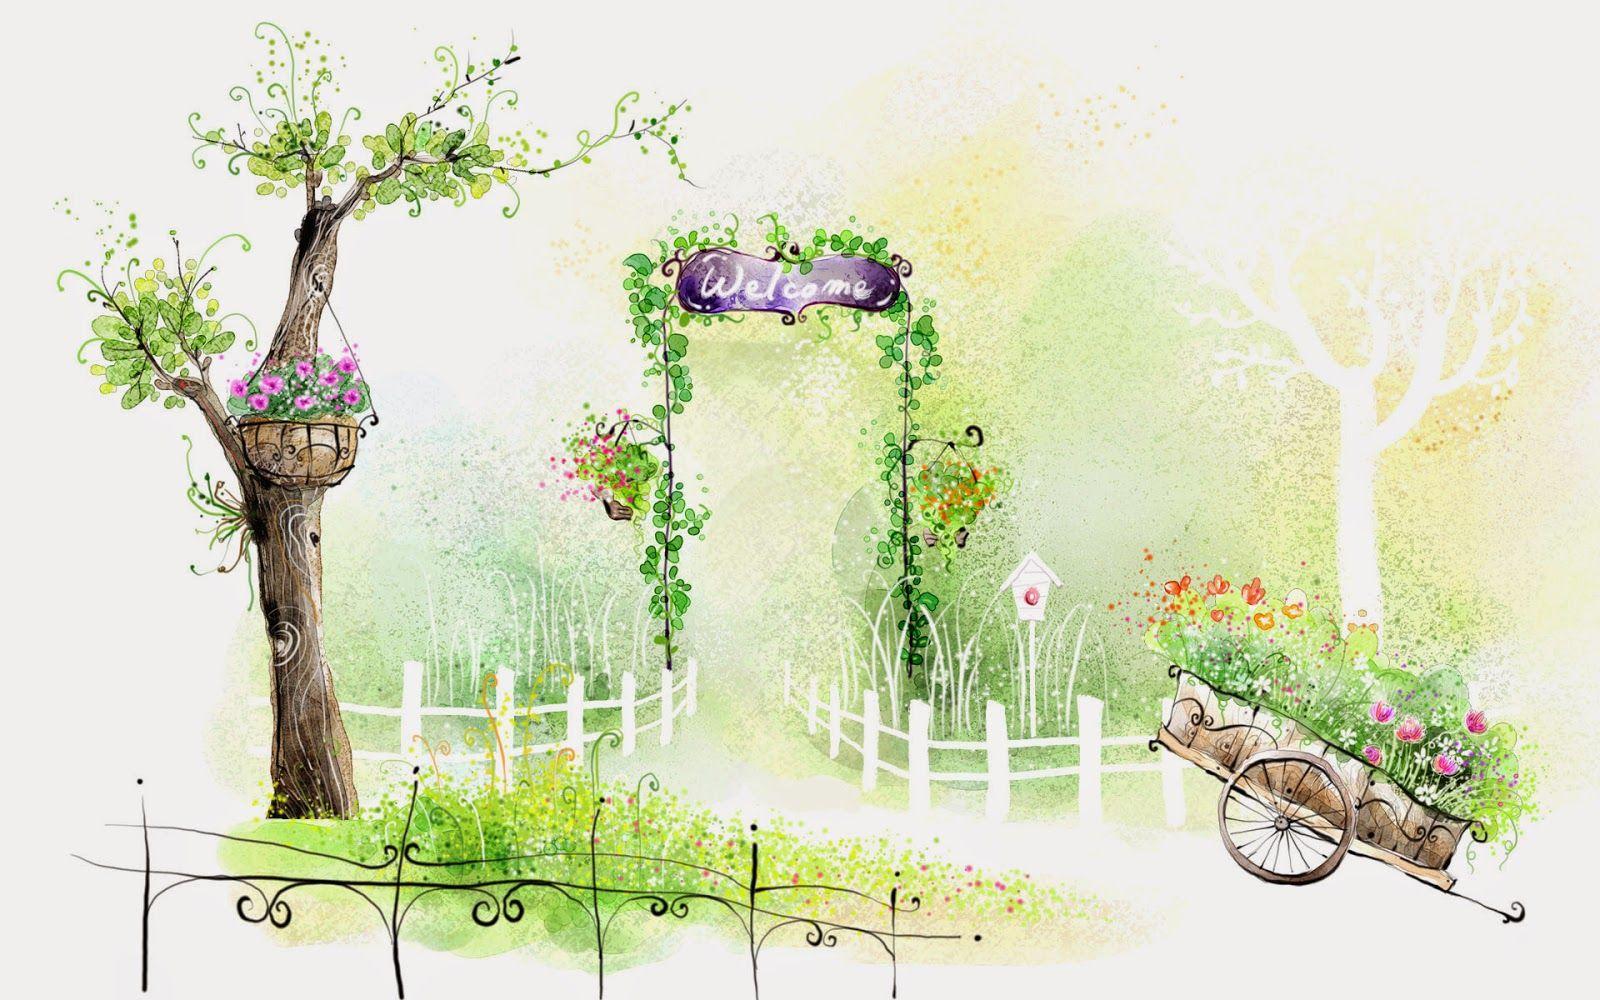 Art Drawing : Romantic Scene Of The Seasons   Romantic Scene   Beautiful  Garden Illustration Painting 27